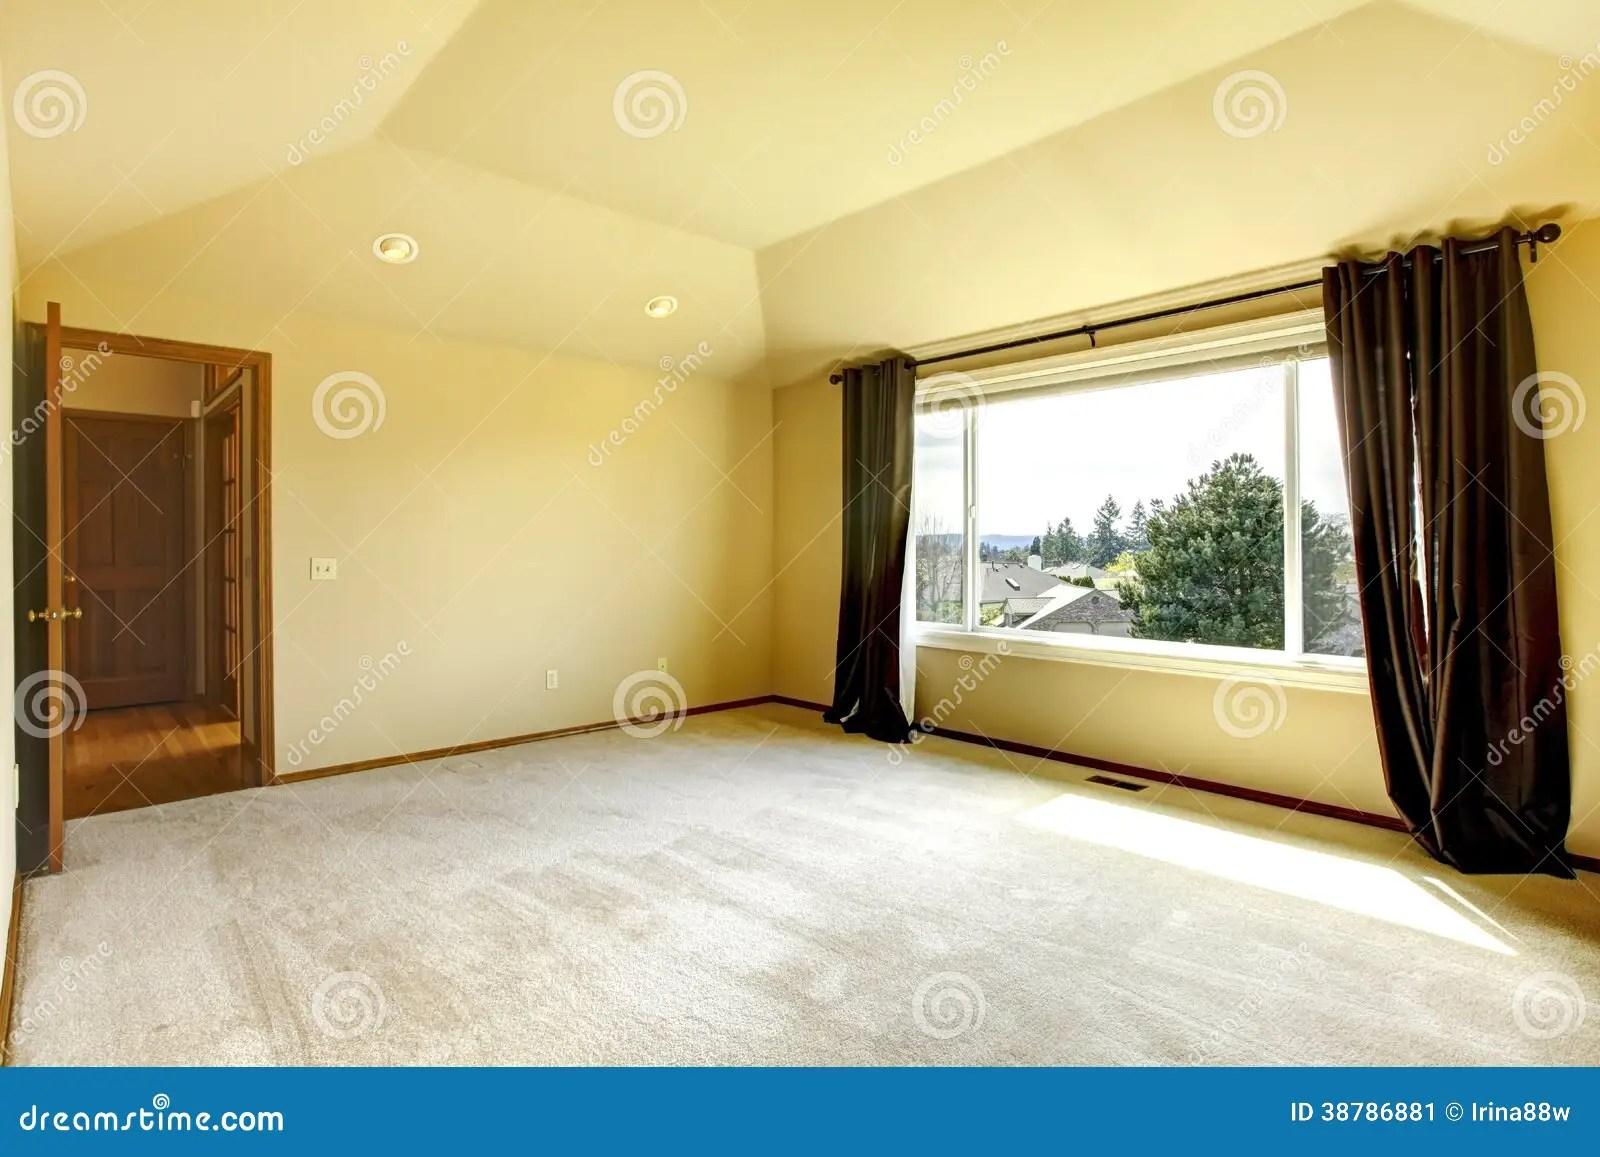 Empty bedroom stock image Image of interior open